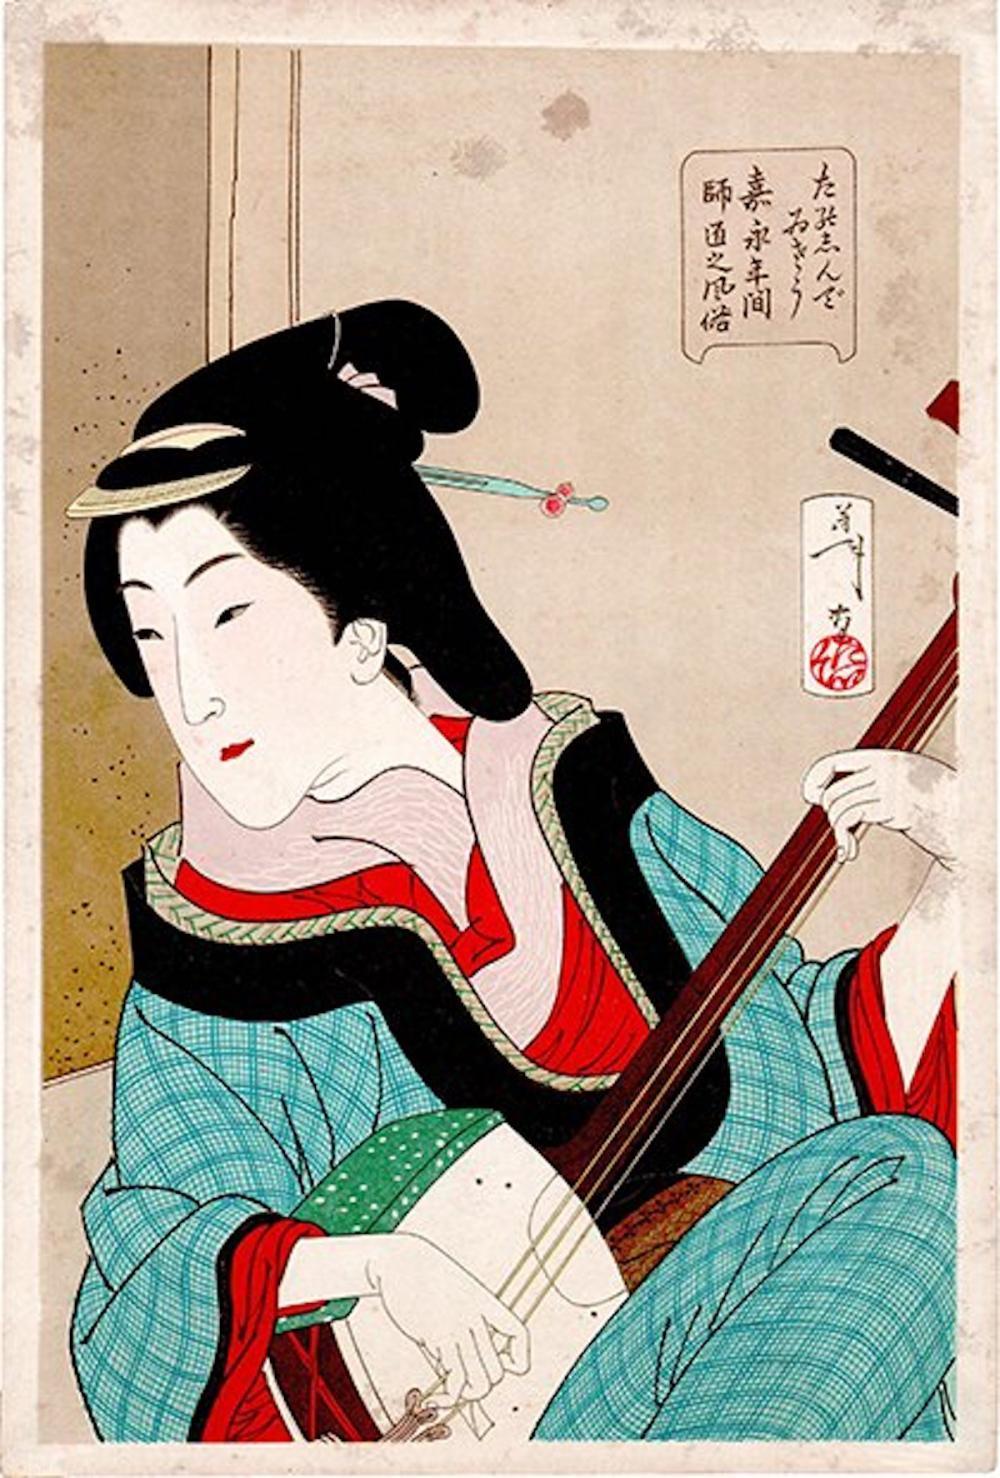 LIQUIDATION SALE ON ALL JAPANESE WOODBLOCK PRINTS & JEWELRIES